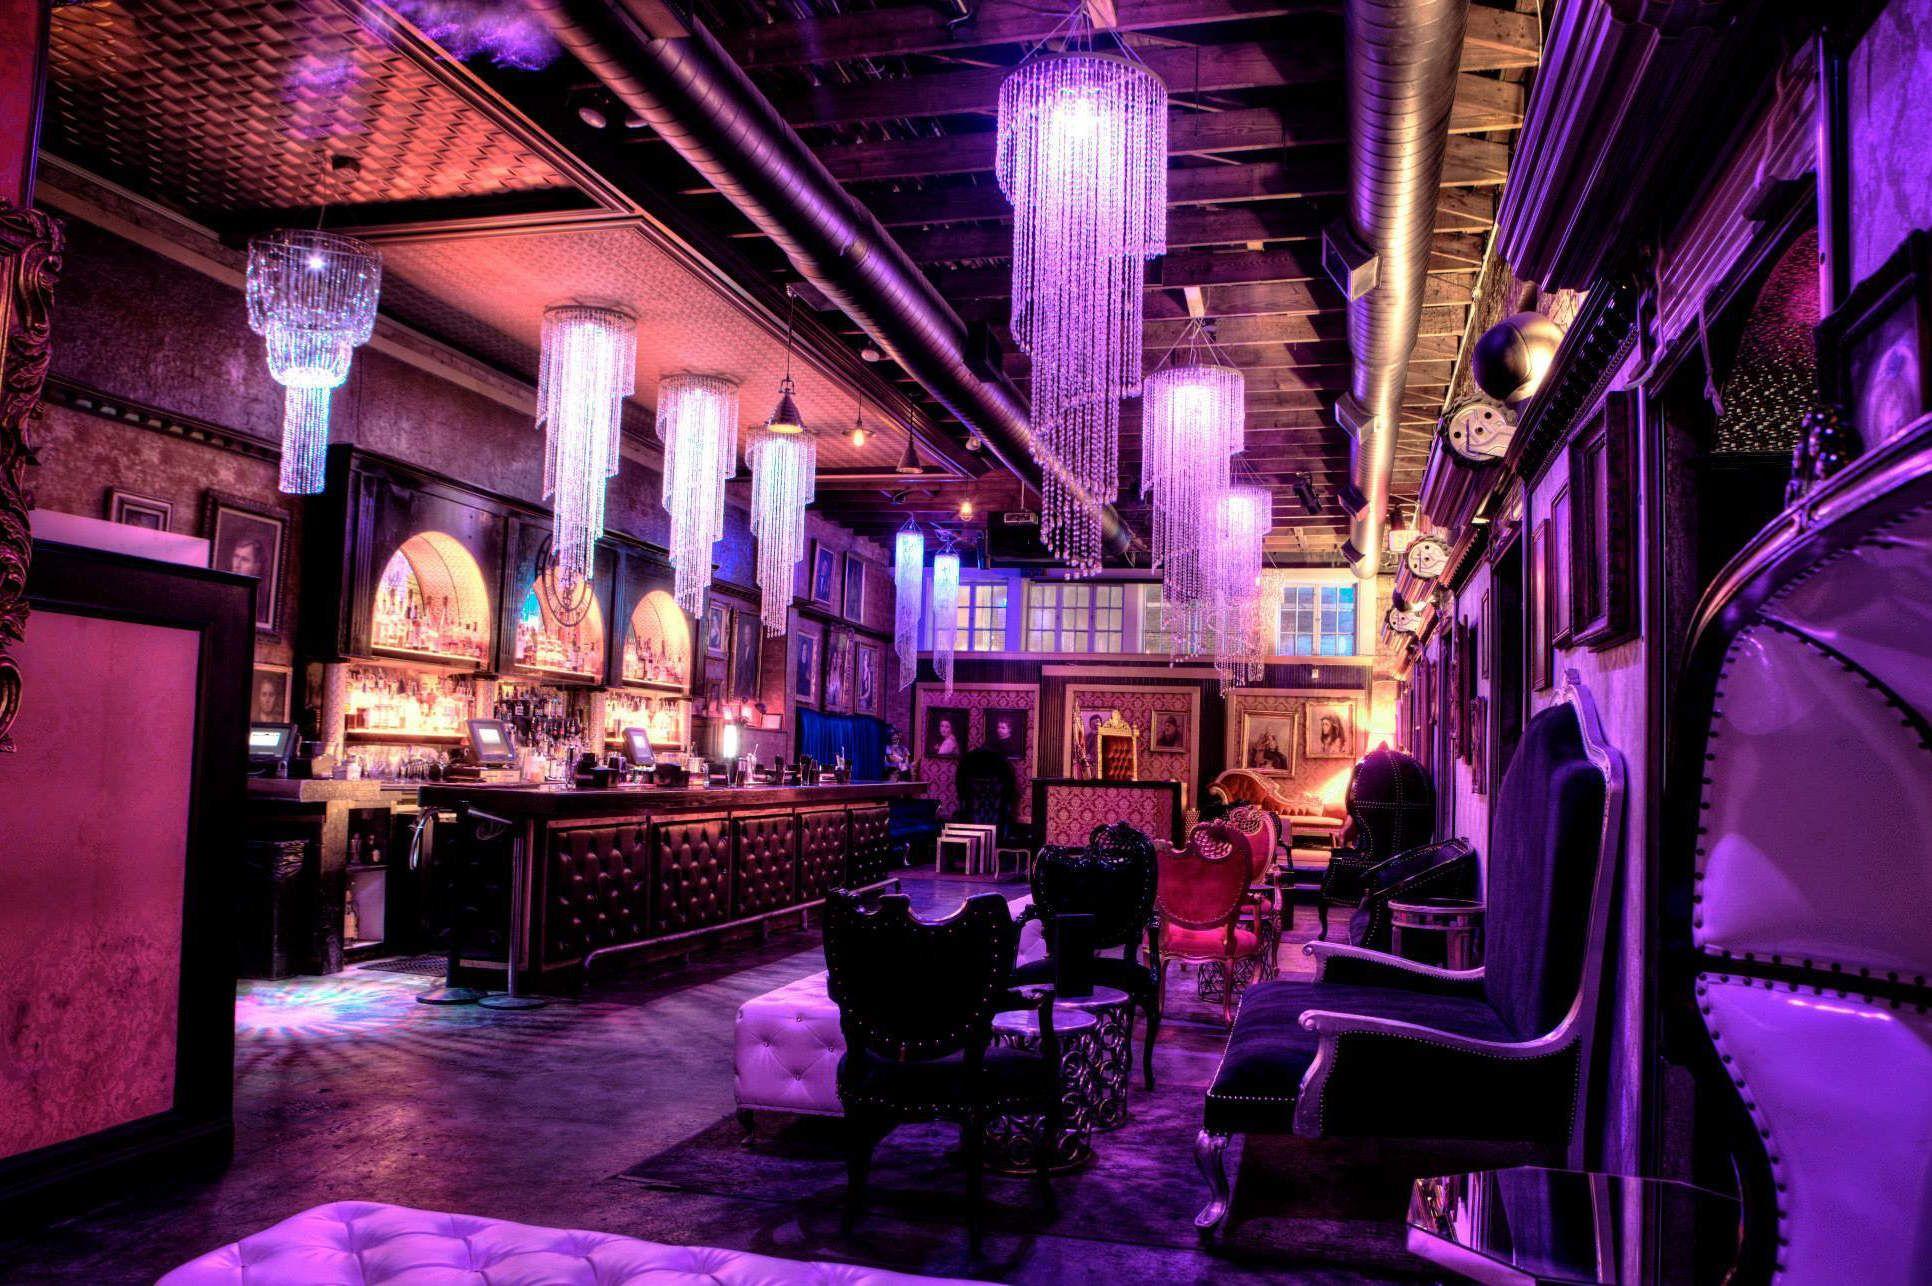 The Best Rooftop Bars in Dallas | Dallas bars, Secret bar ...